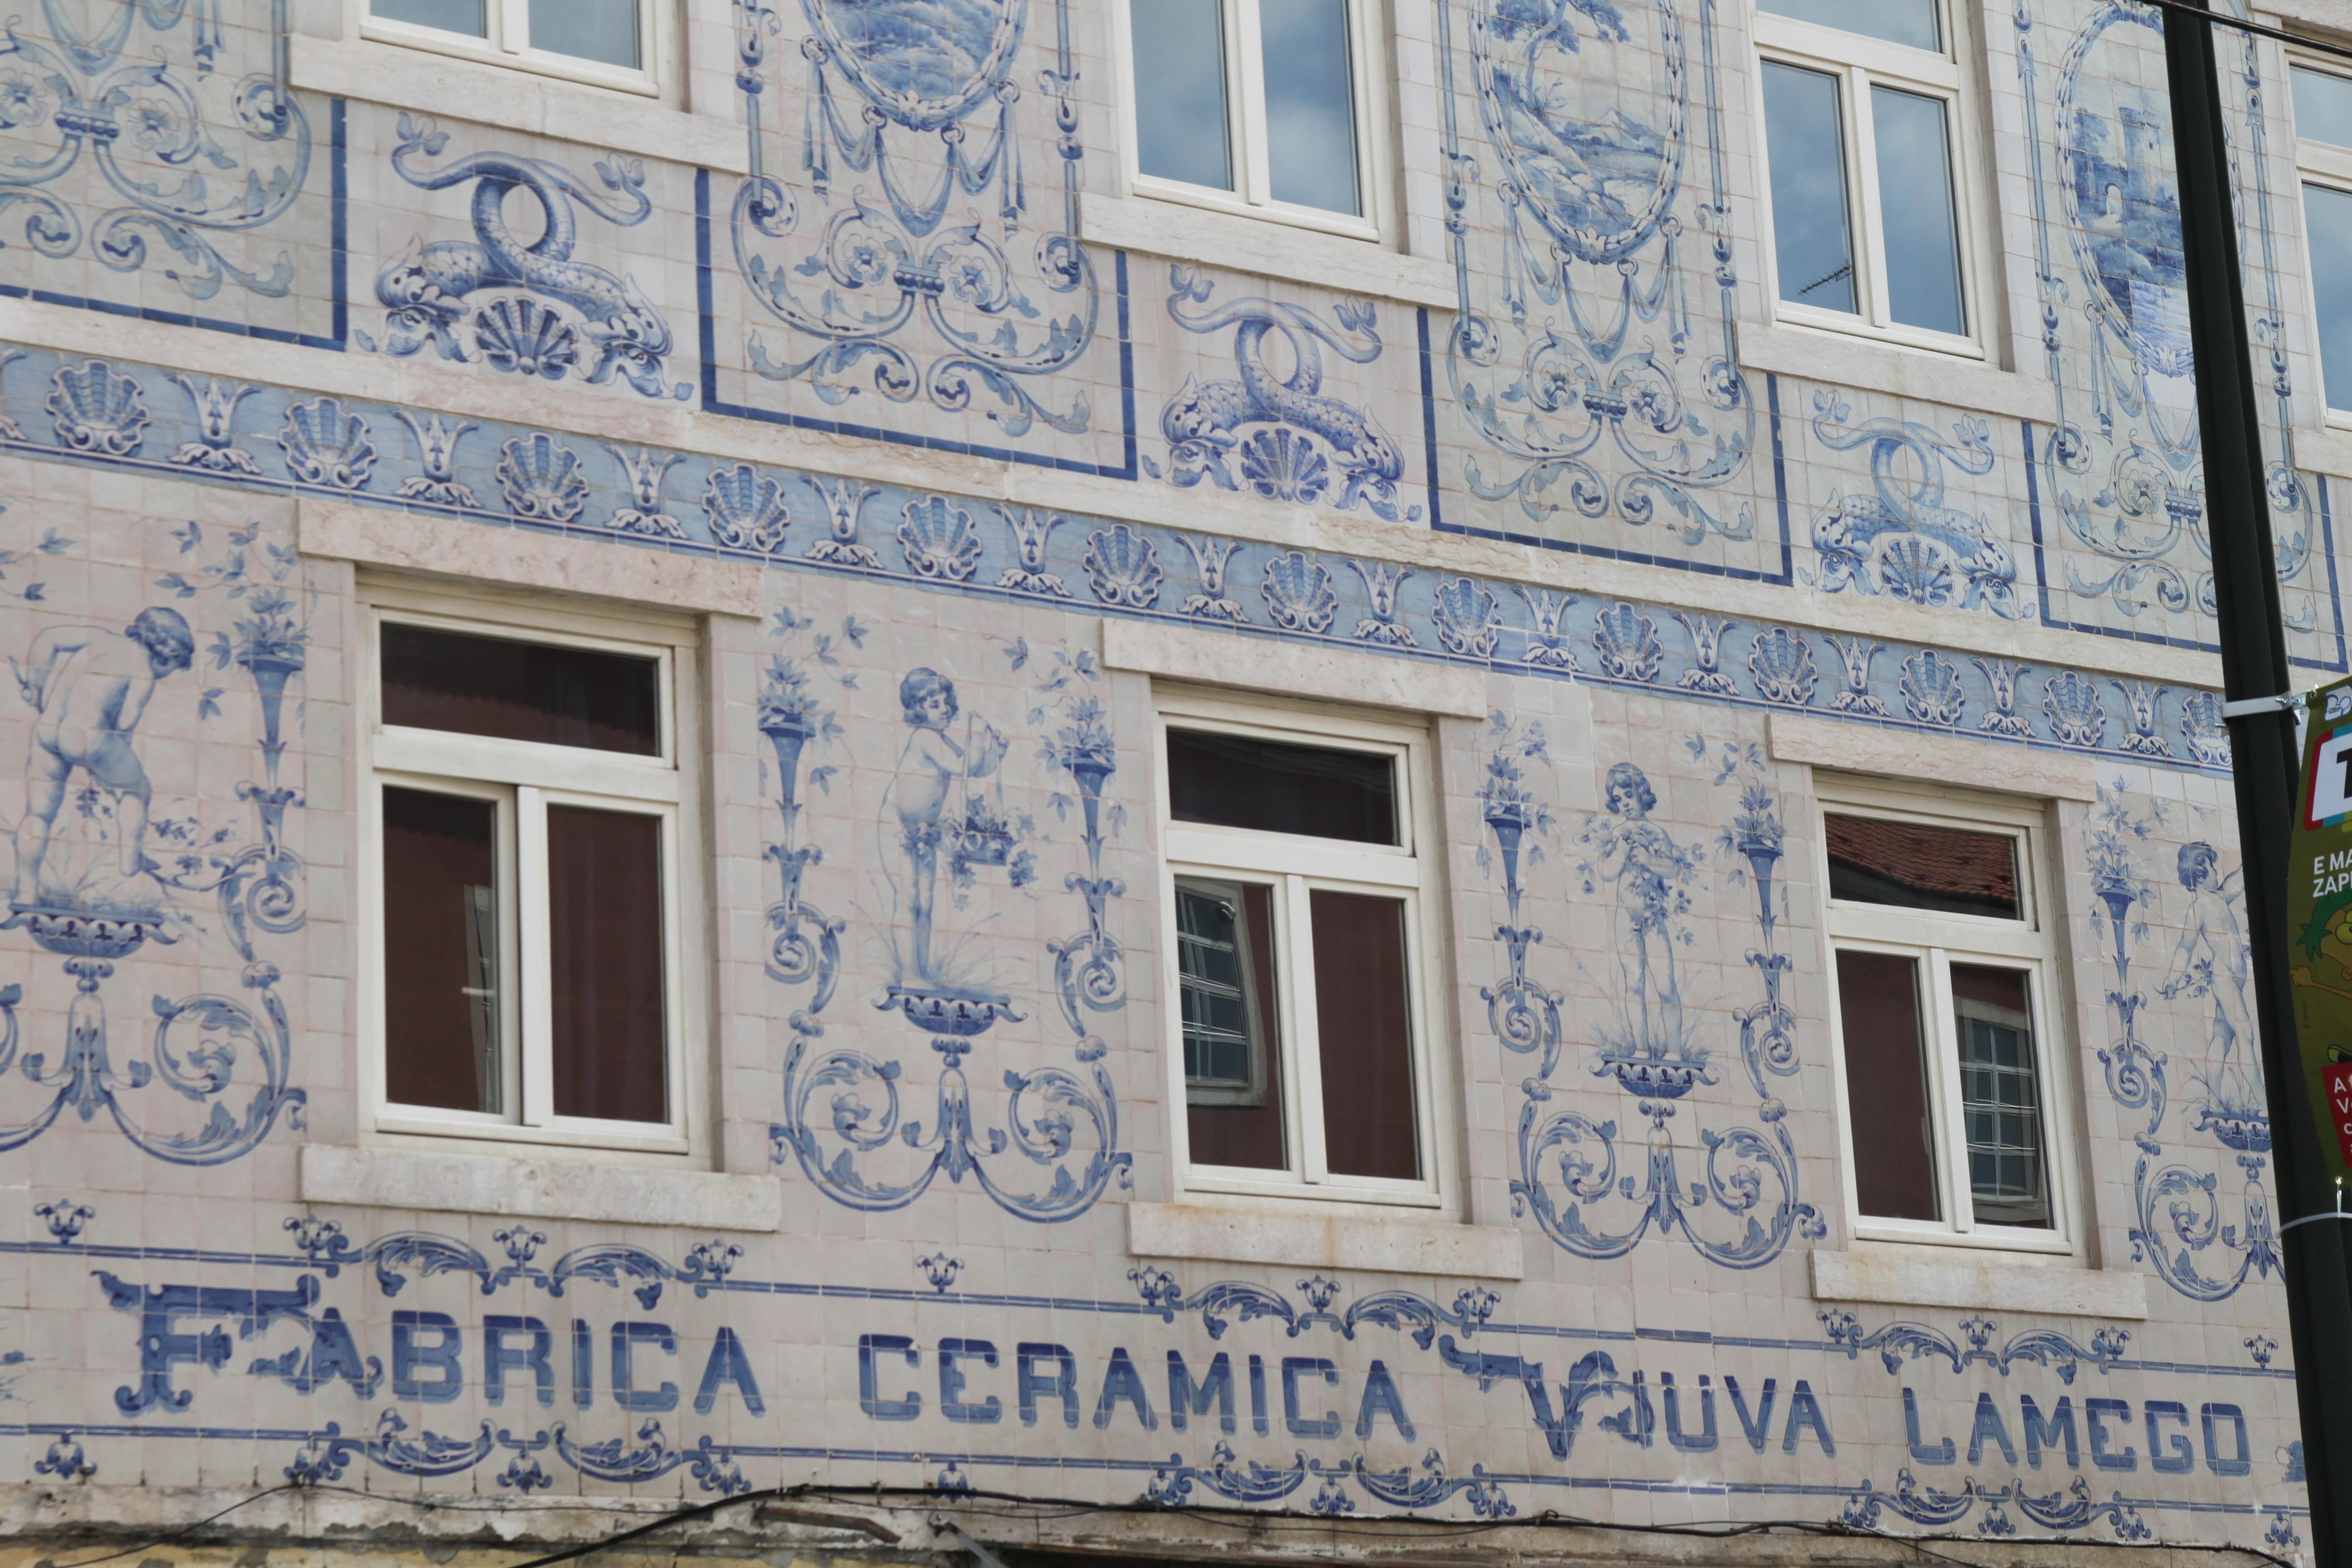 File vi va lamego alm reis wikimedia commons for Casa dos azulejos lisboa